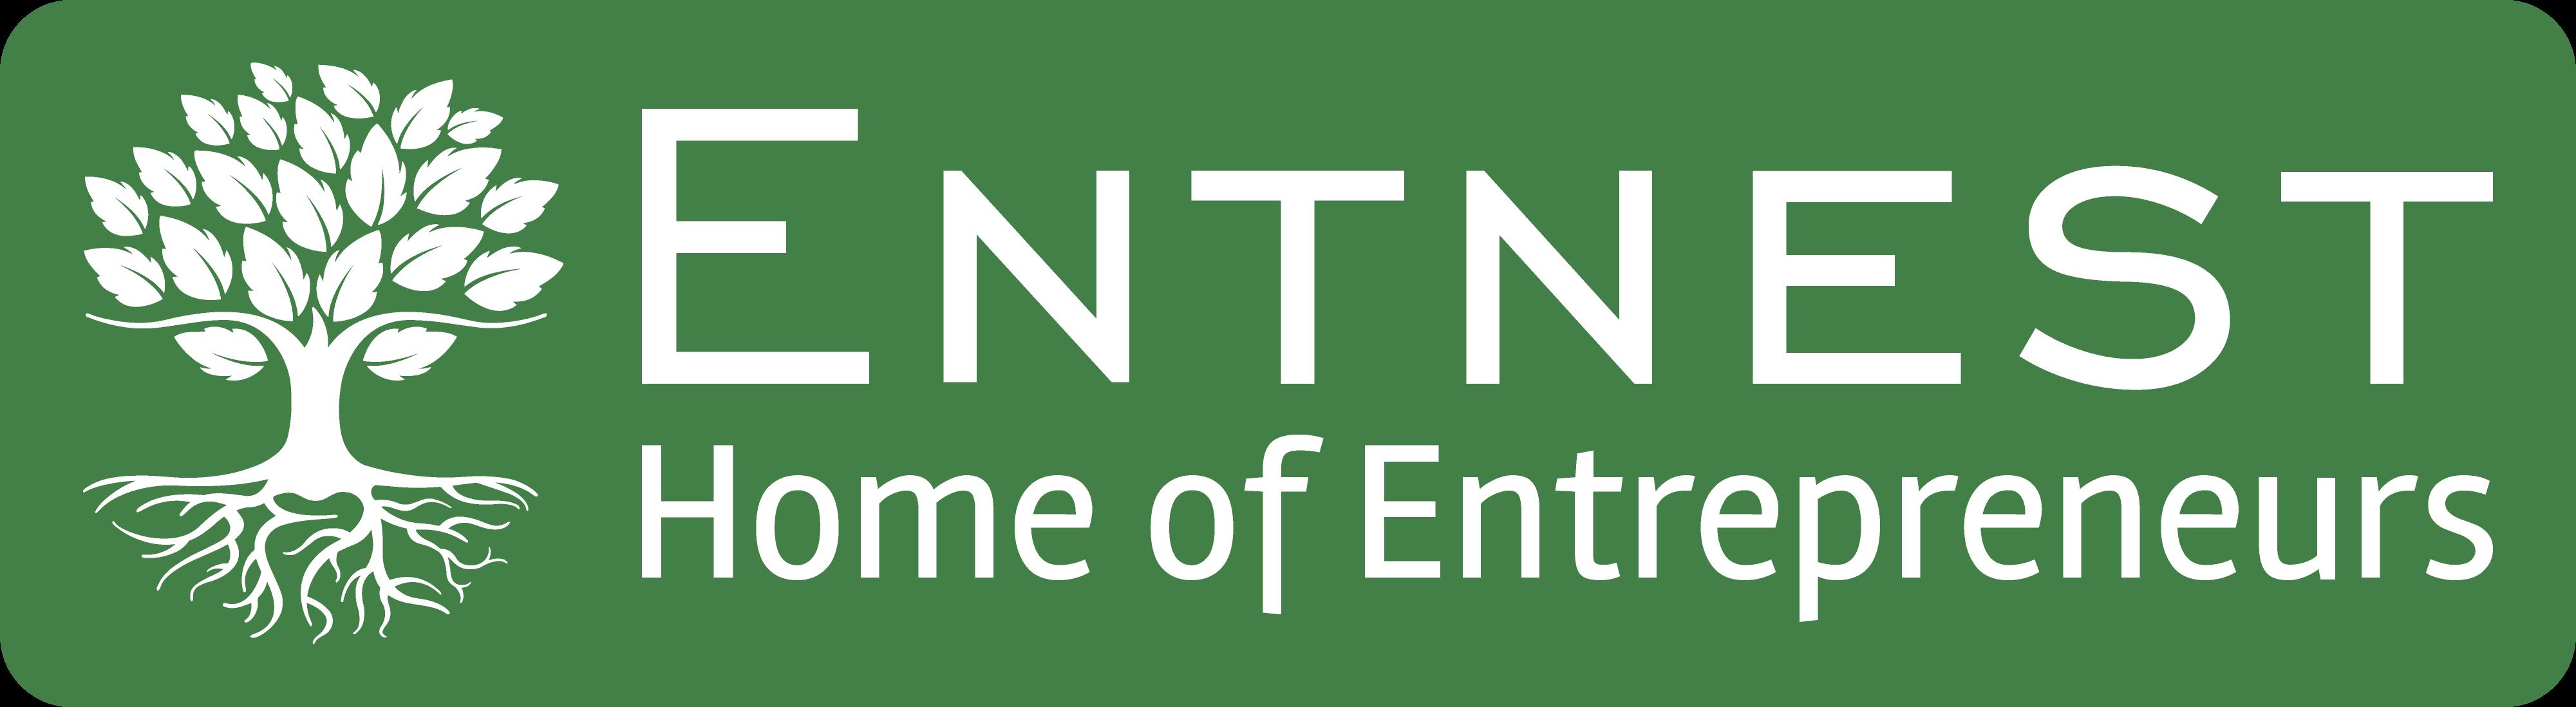 www.entnest.com